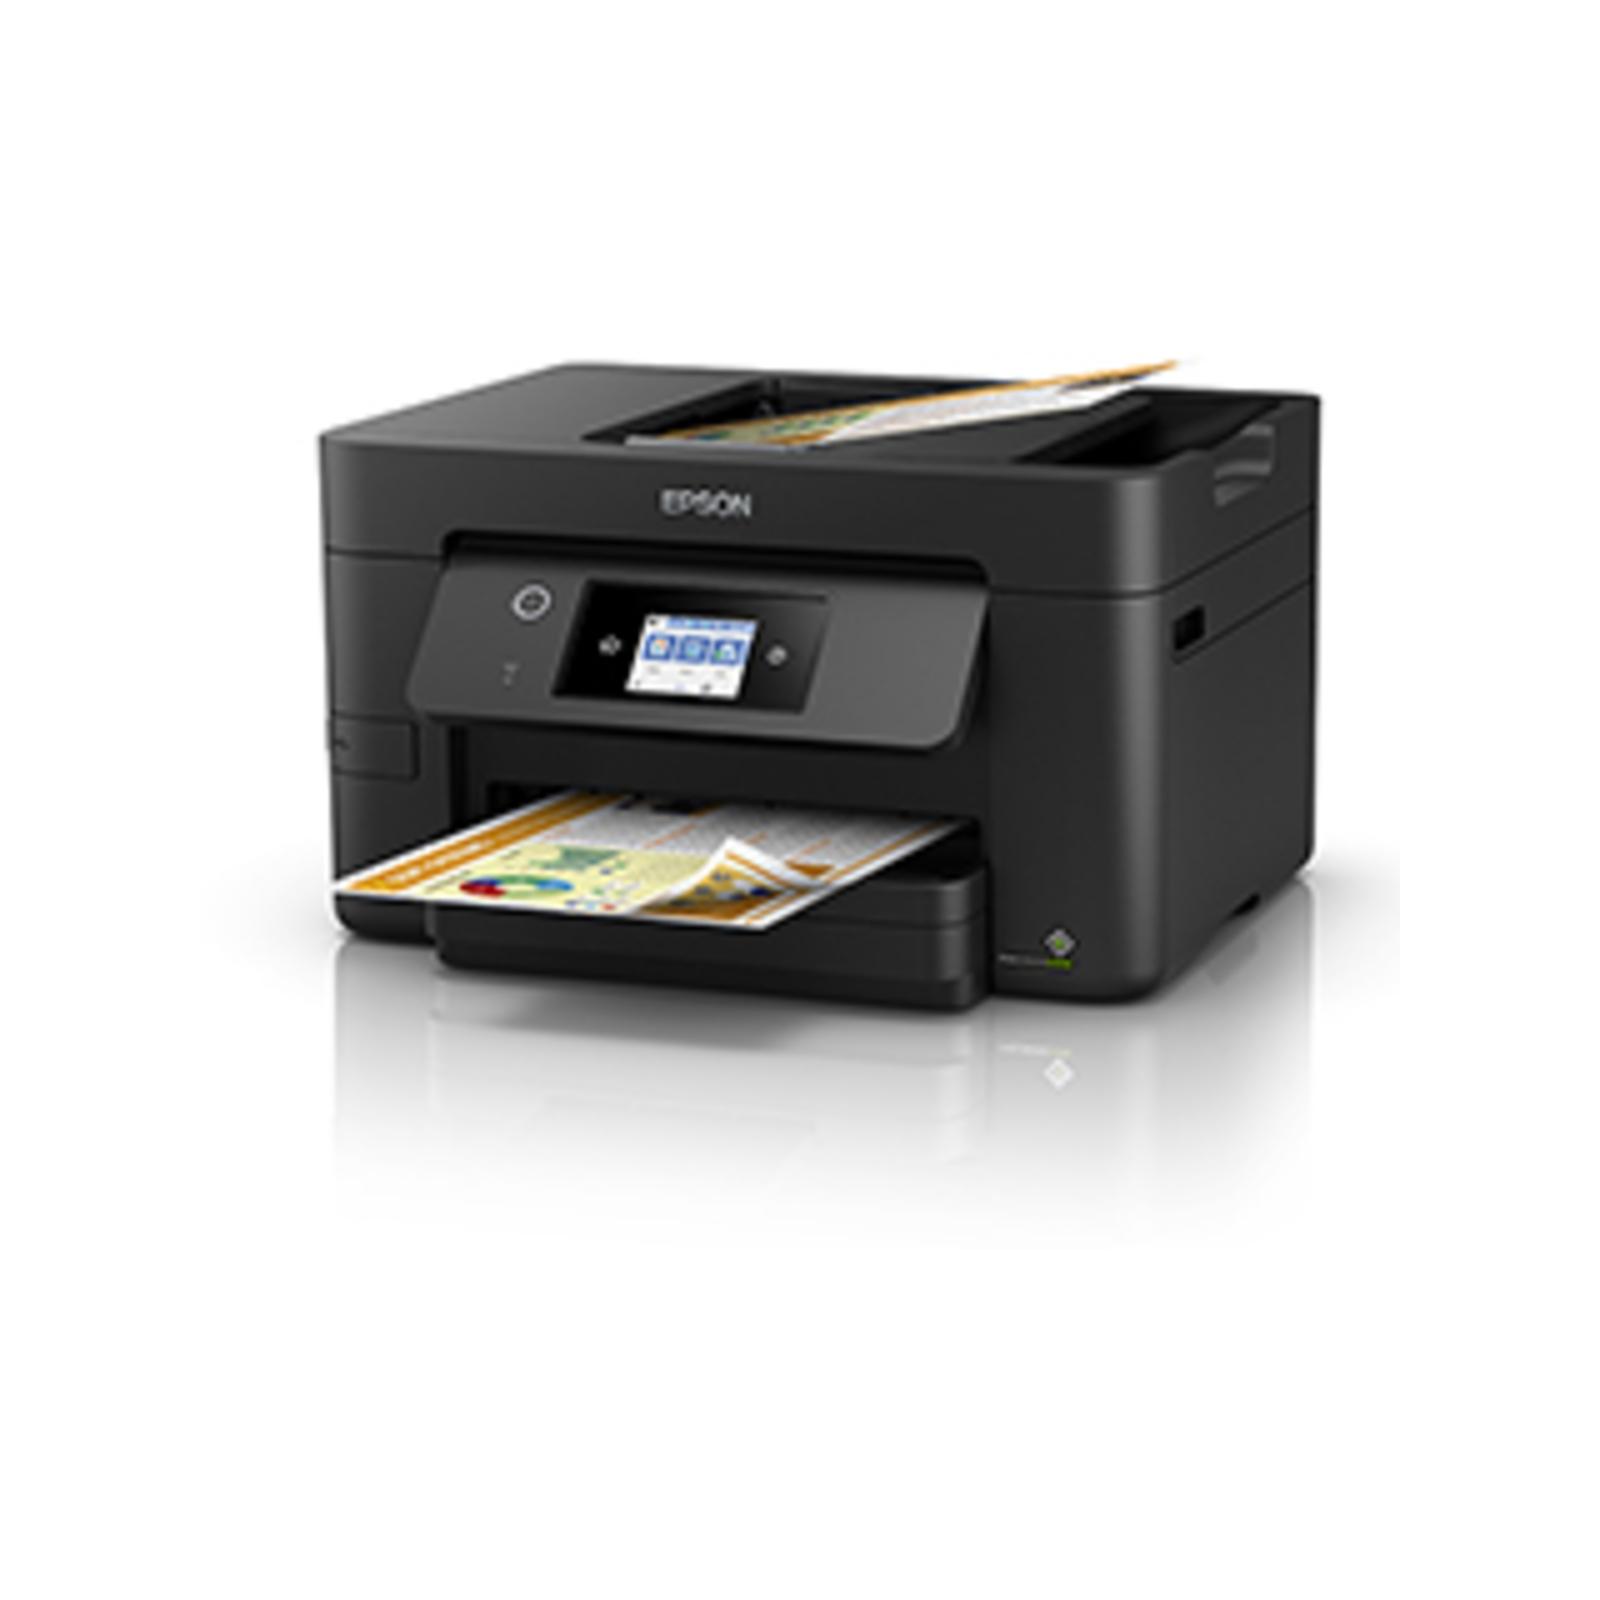 Epson WorkForce Pro WF-3825 A4 Inkjet MFP - Print, Copy, Scan, Fax, Ethernet, Wi-Fi Direct